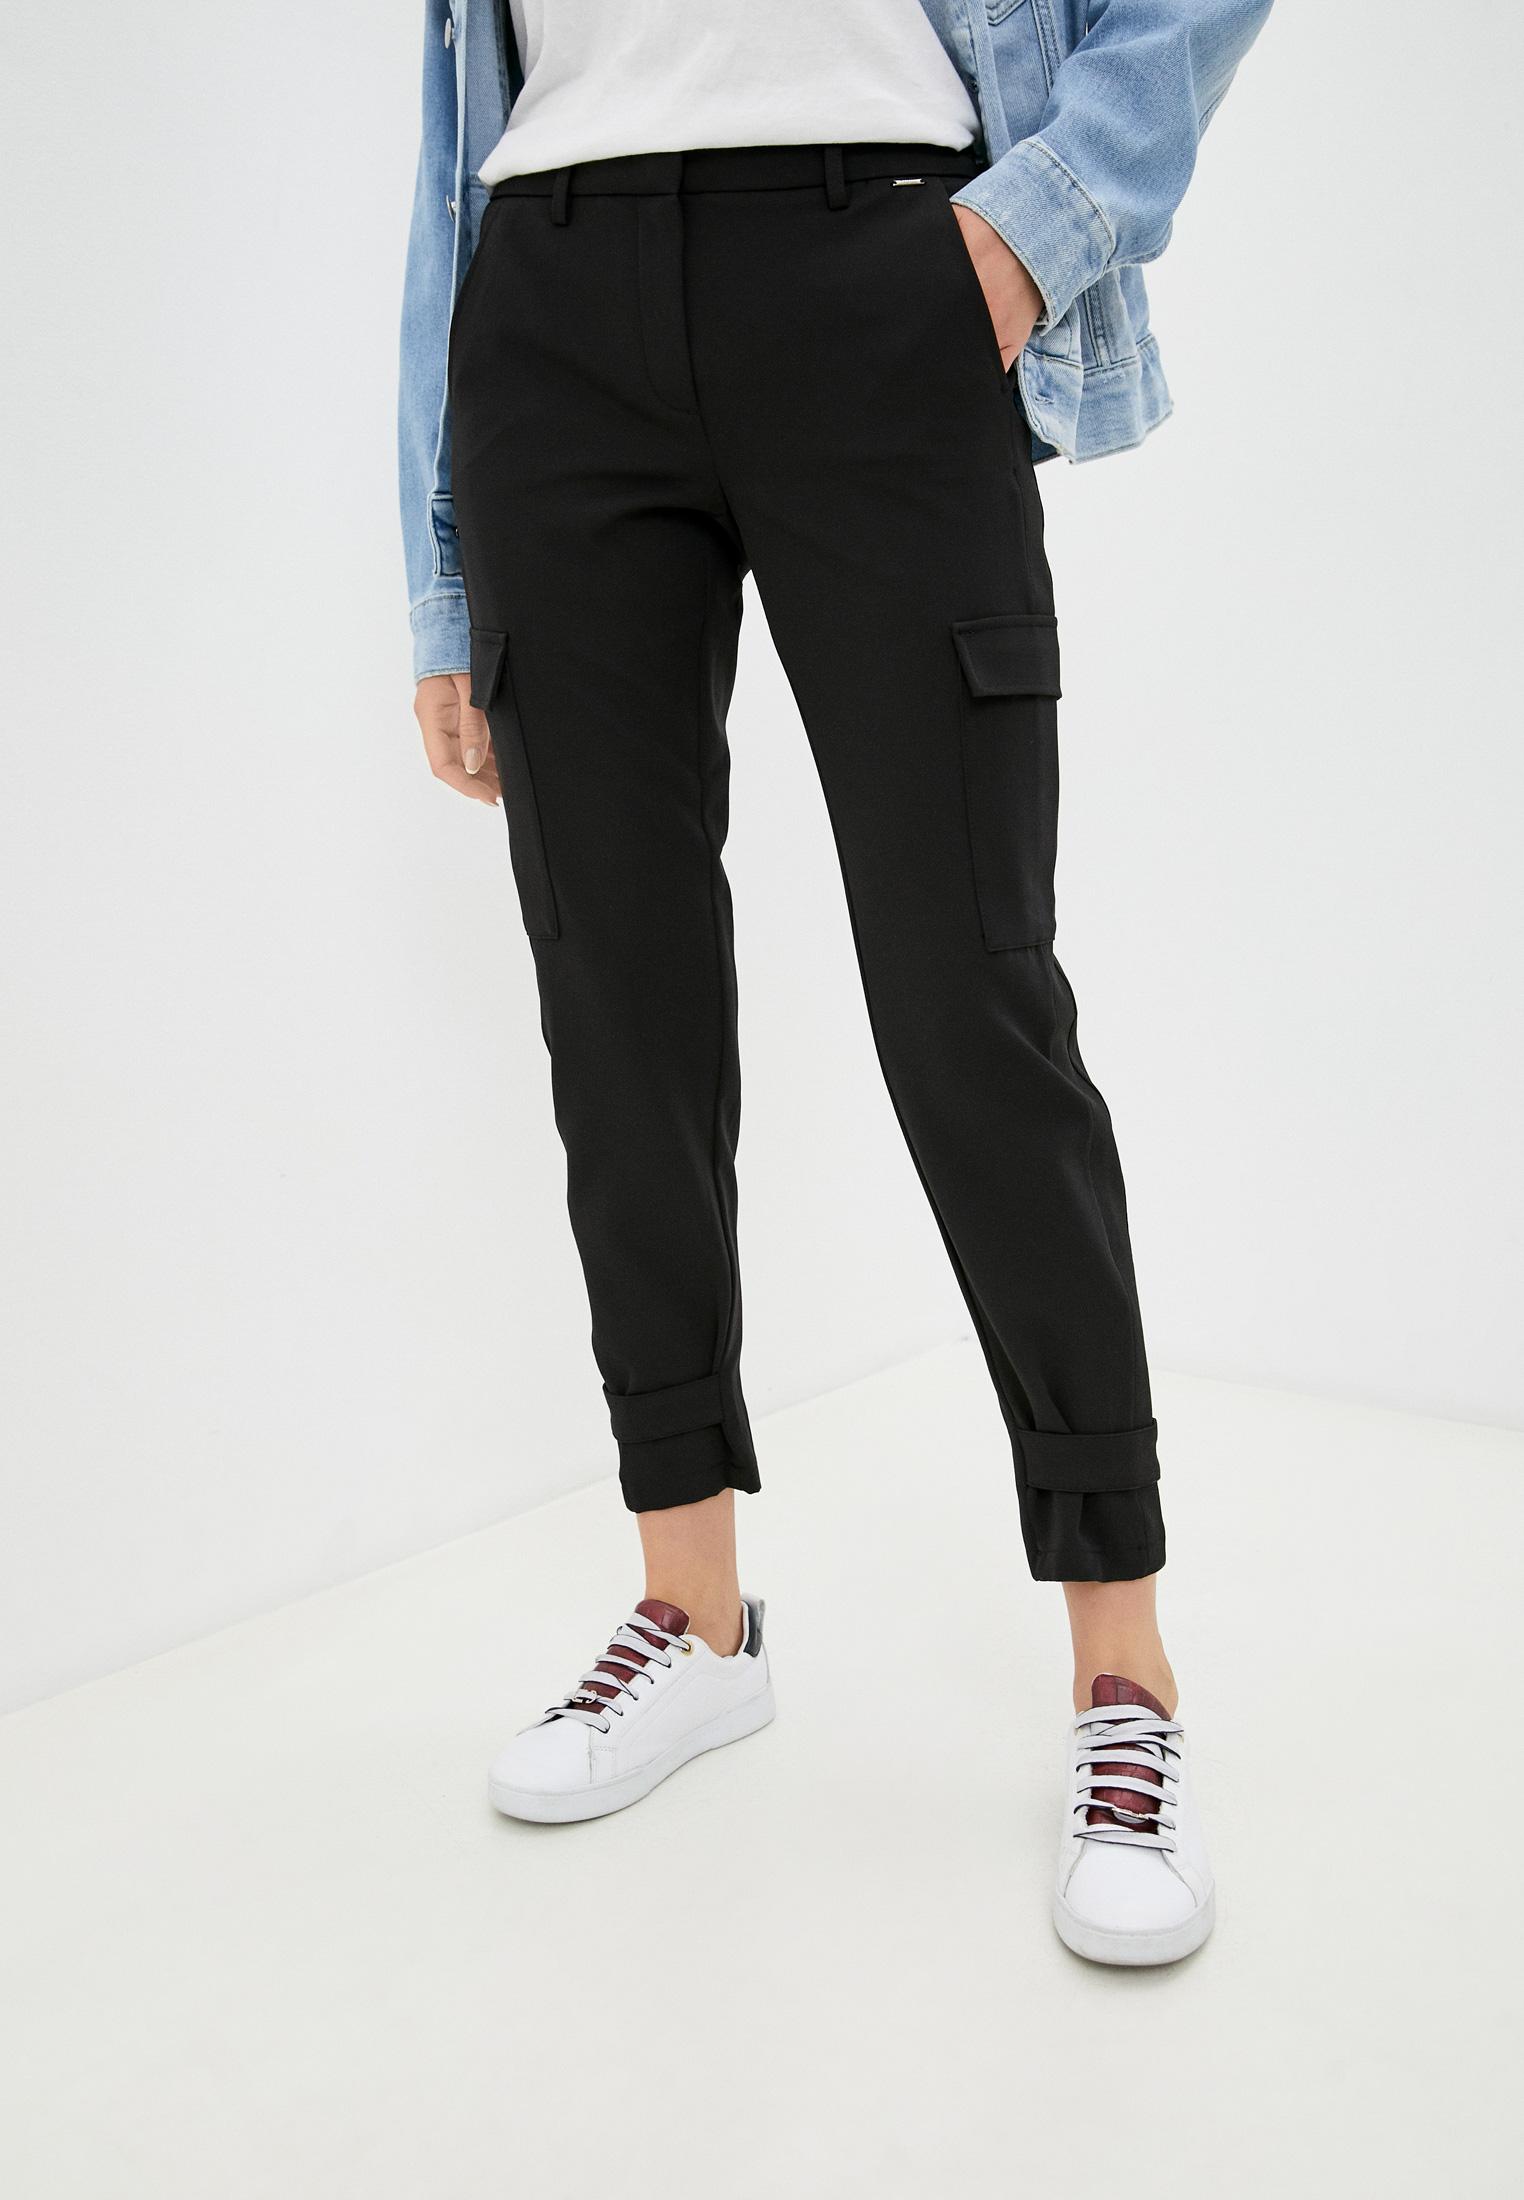 Женские зауженные брюки Taifun Брюки Taifun